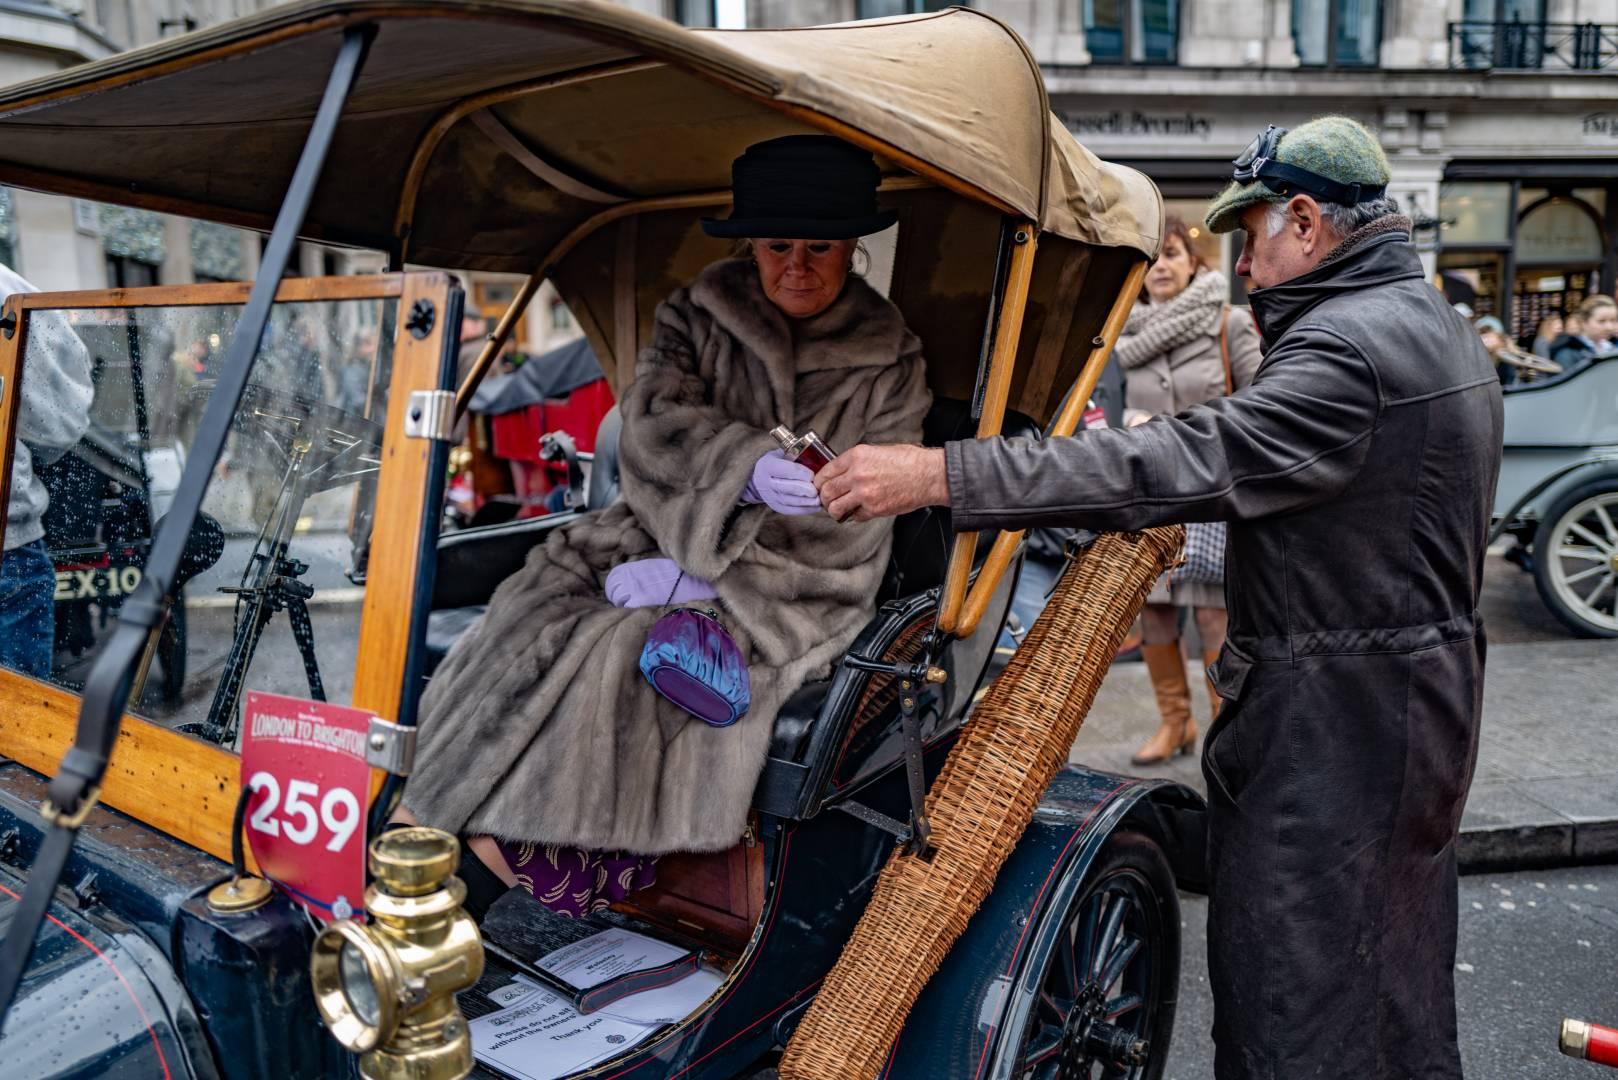 Wicker umbrella case — and a stiff whisky to keep the memsahib happy